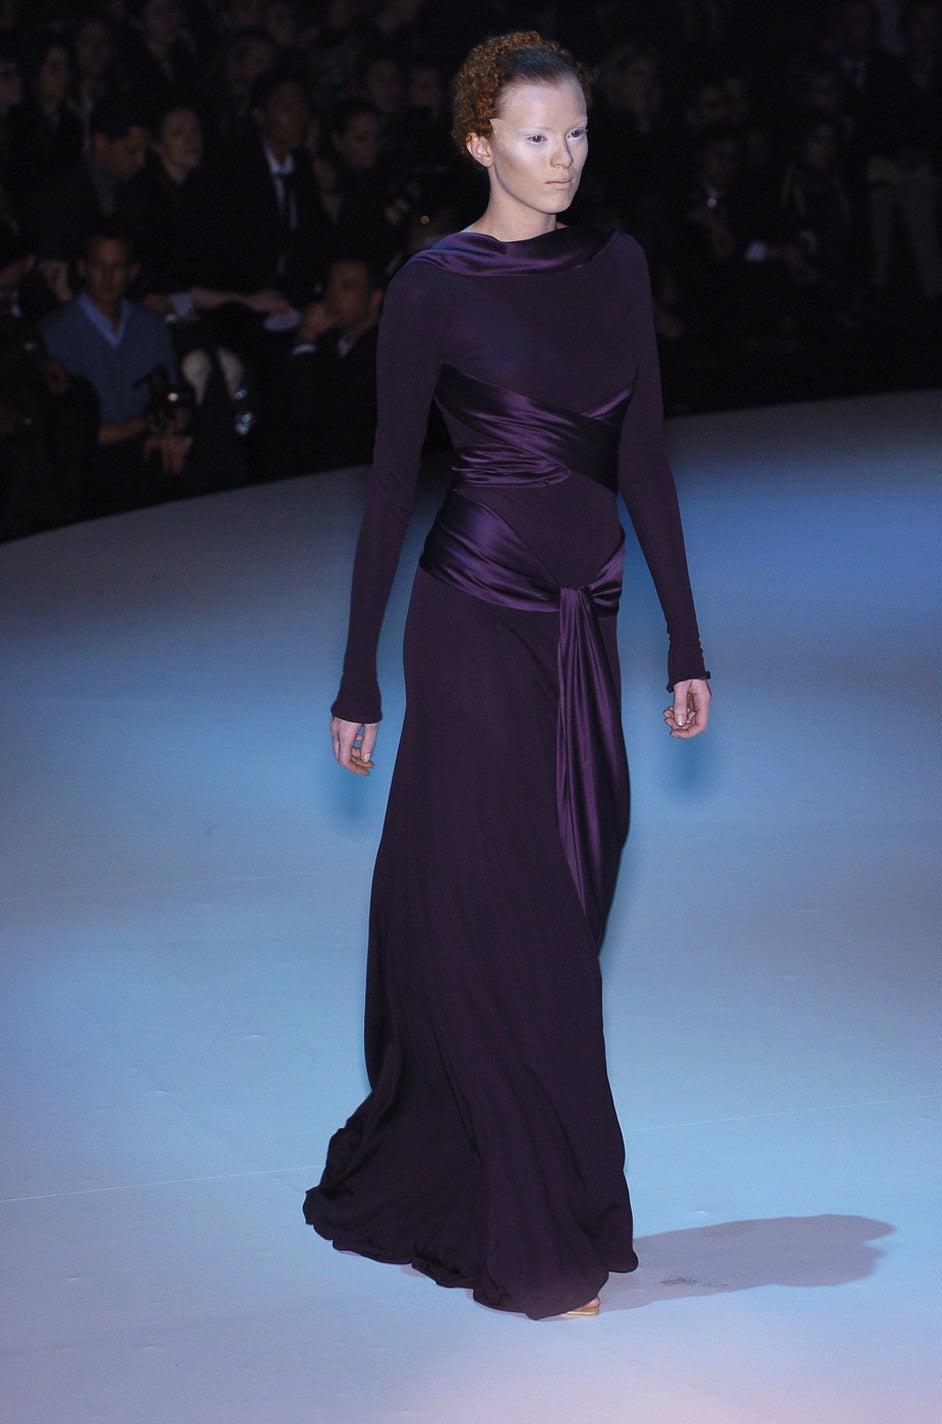 2004 F/W Alexander McQueen Purple Tie Runway Dress For Sale 3